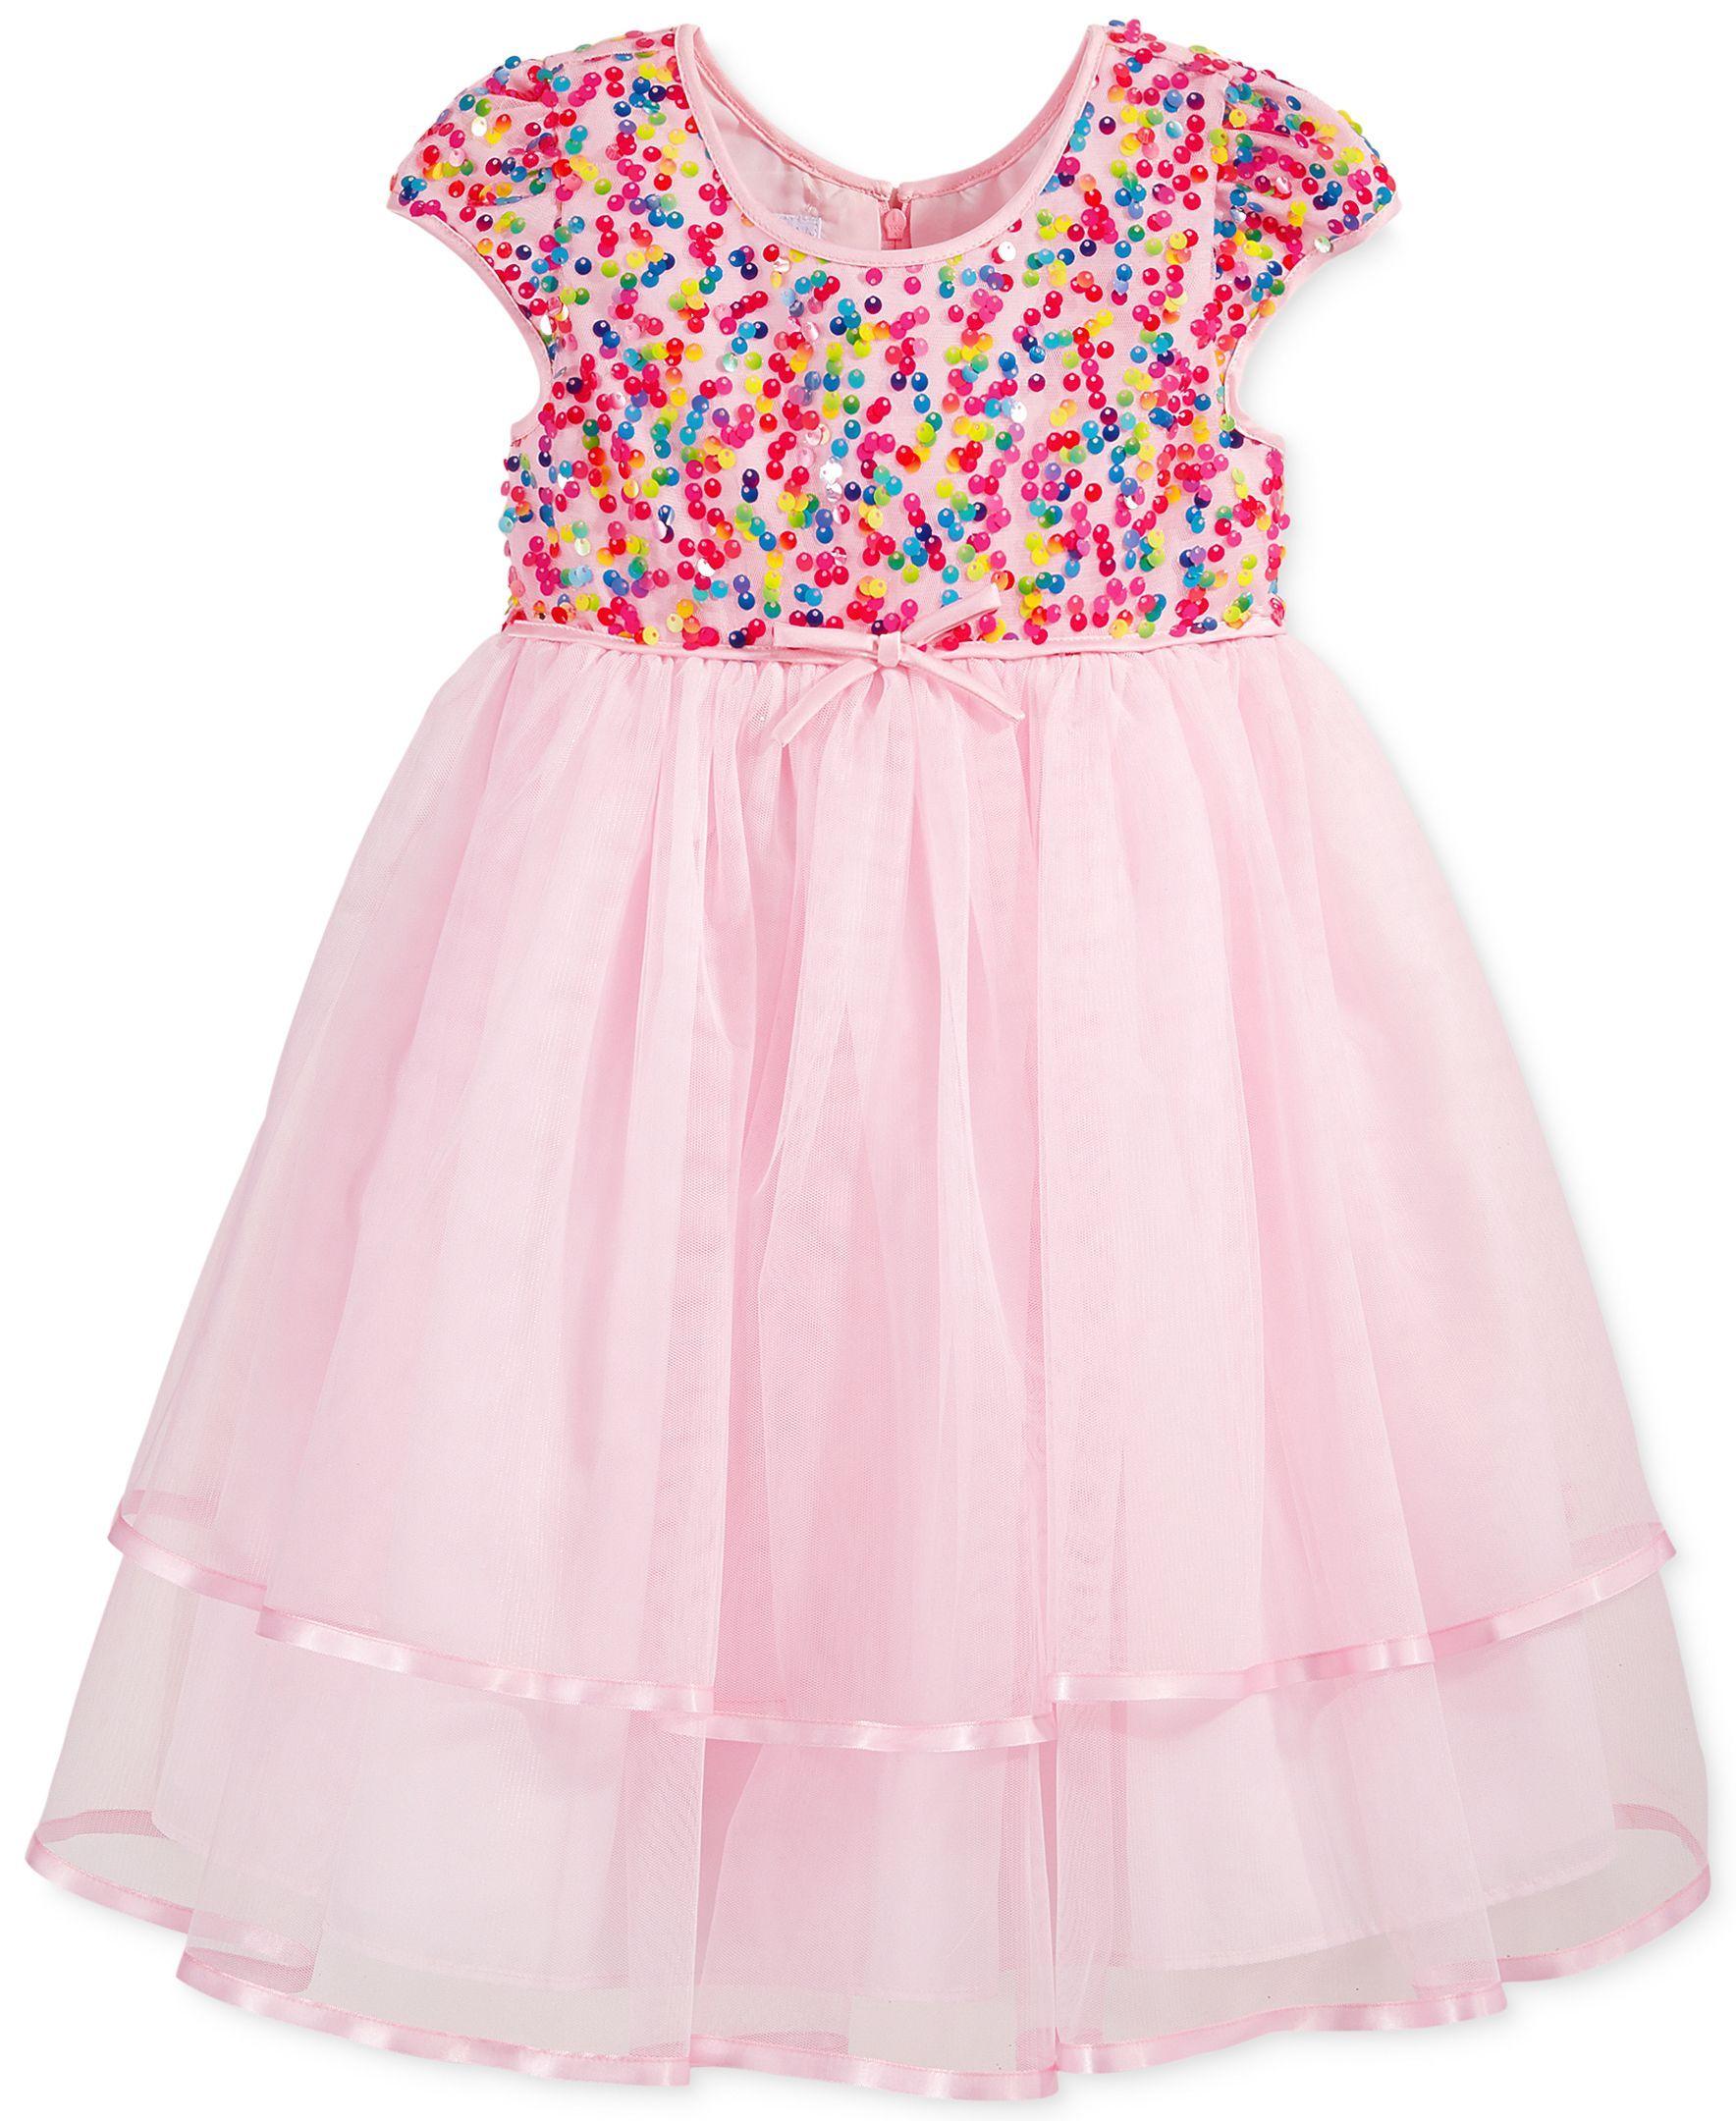 Bella by Marmellata Girls Sequin Bodice Dress